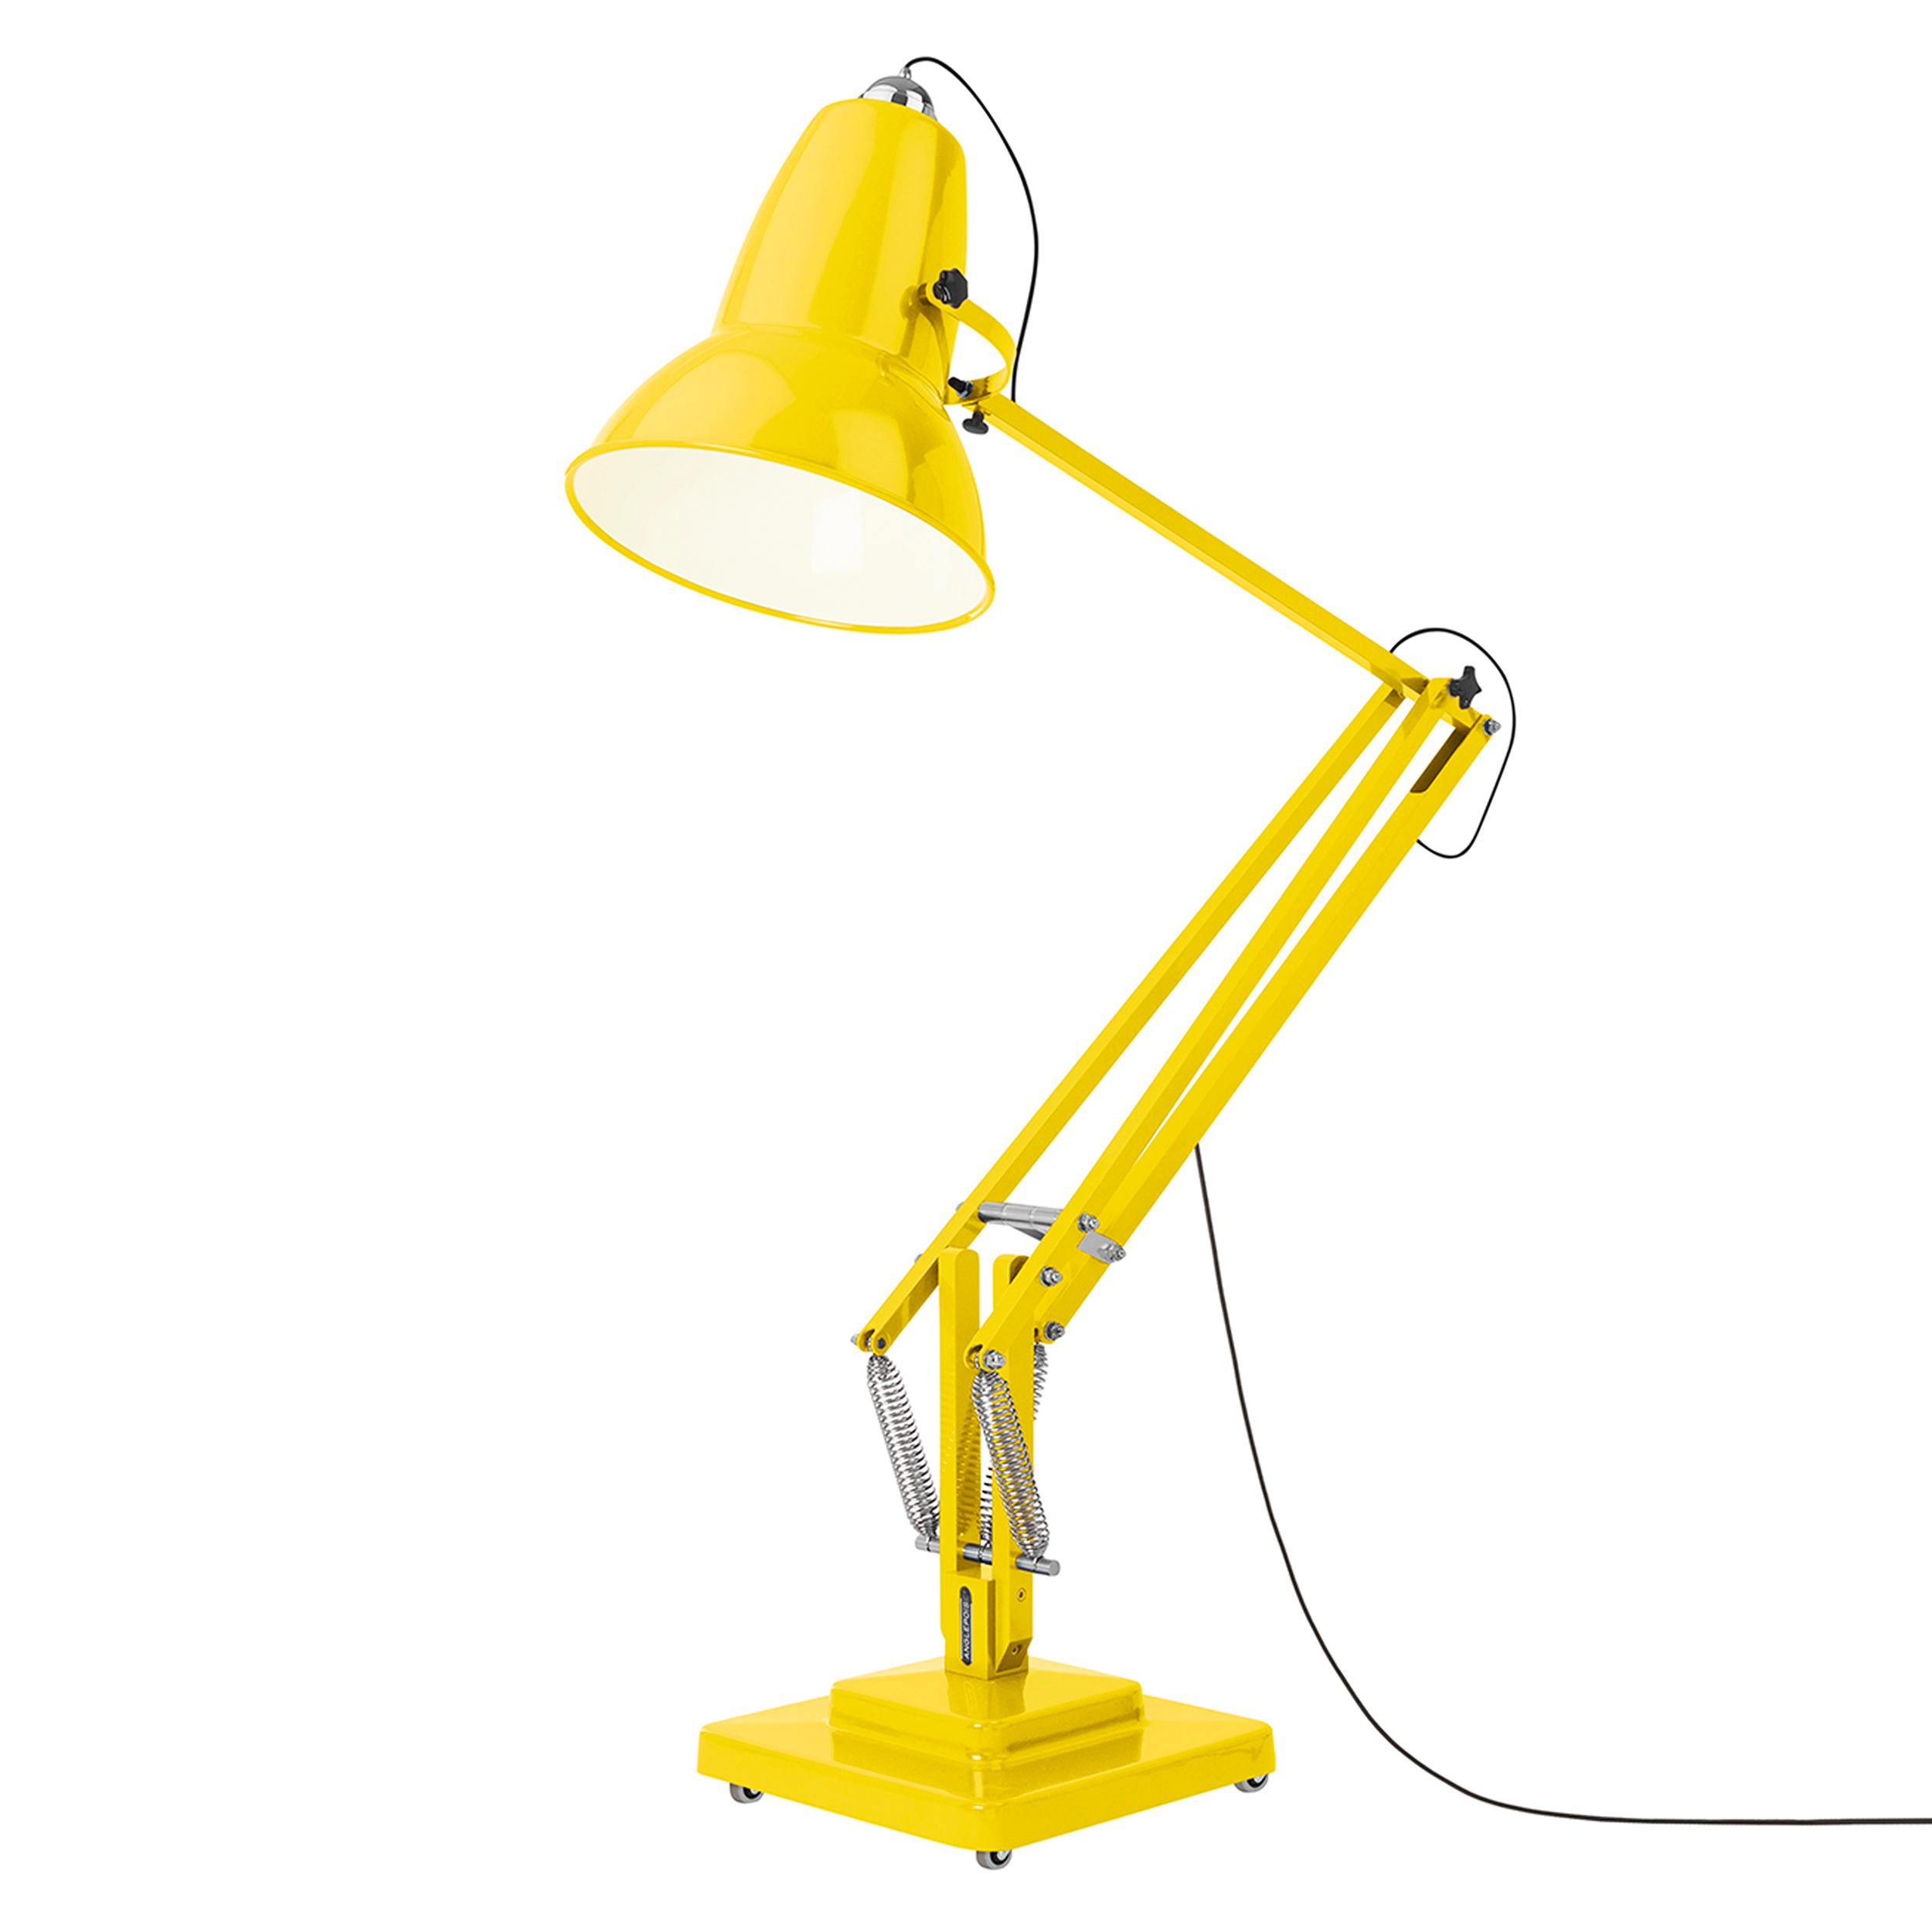 Original 1227 Giant Floor Lamp Buy Online Now At All Square Lighting